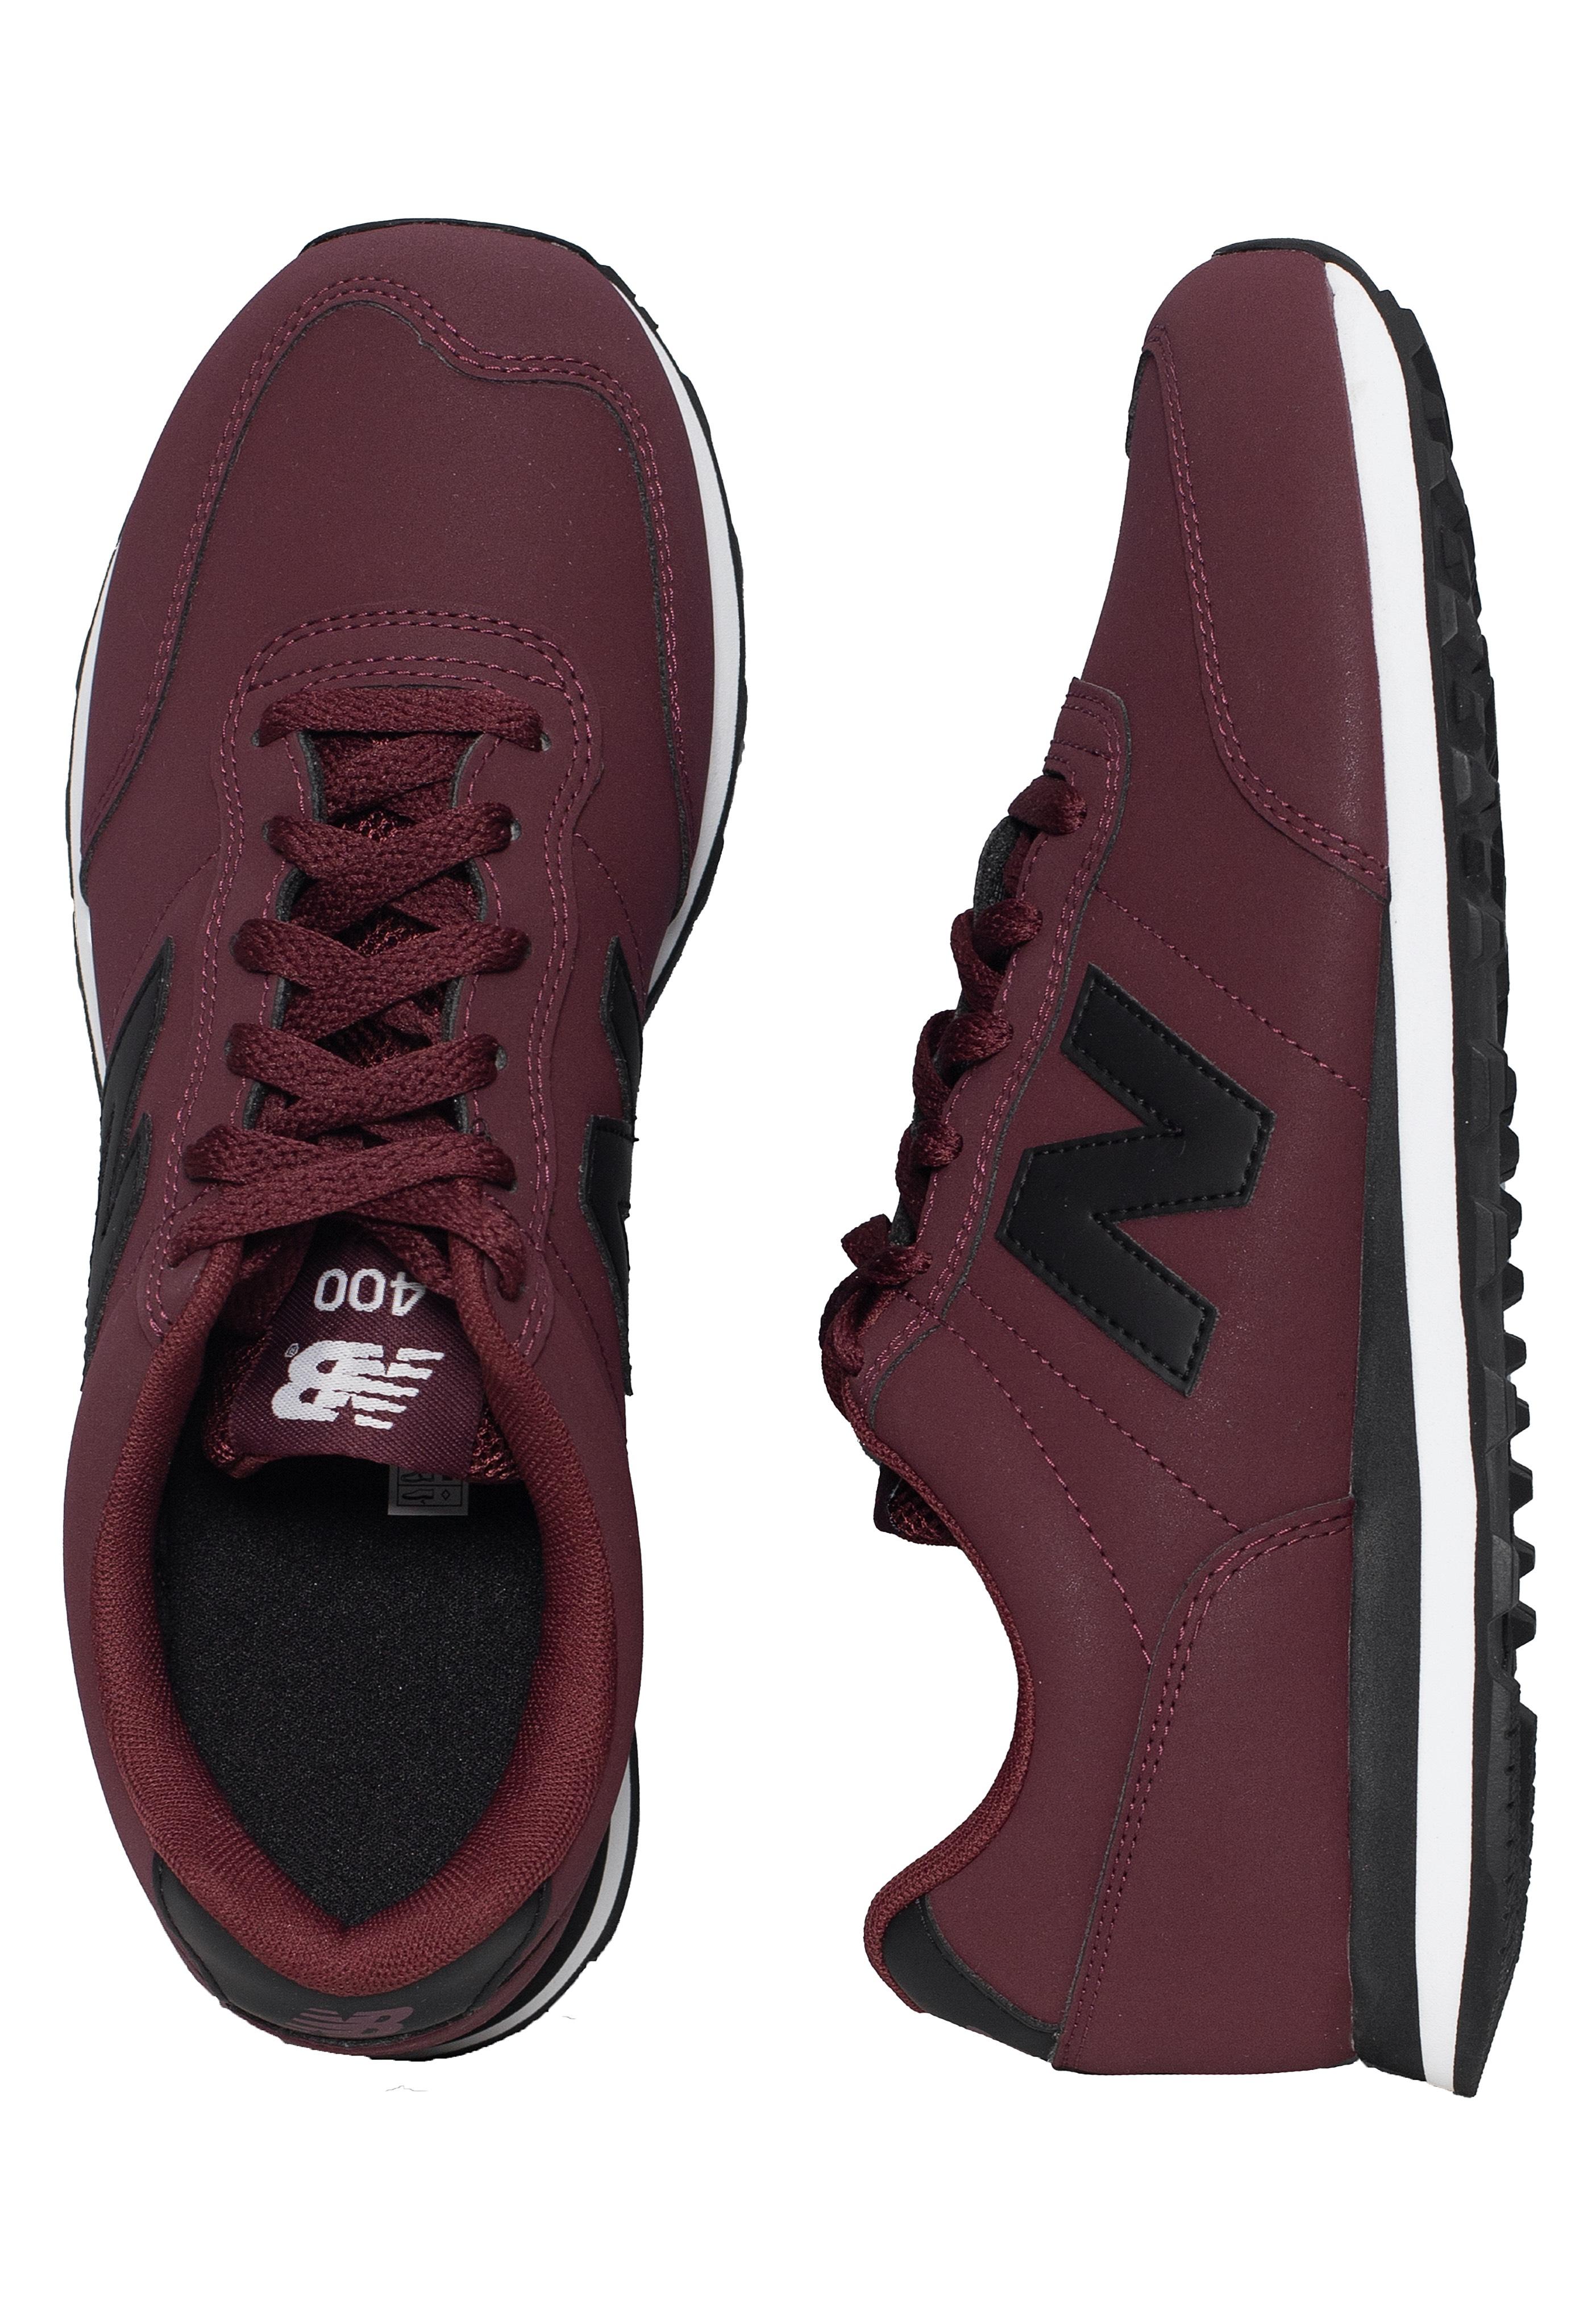 New Balance - GW400V1 Burgundy/Black - Sneakers